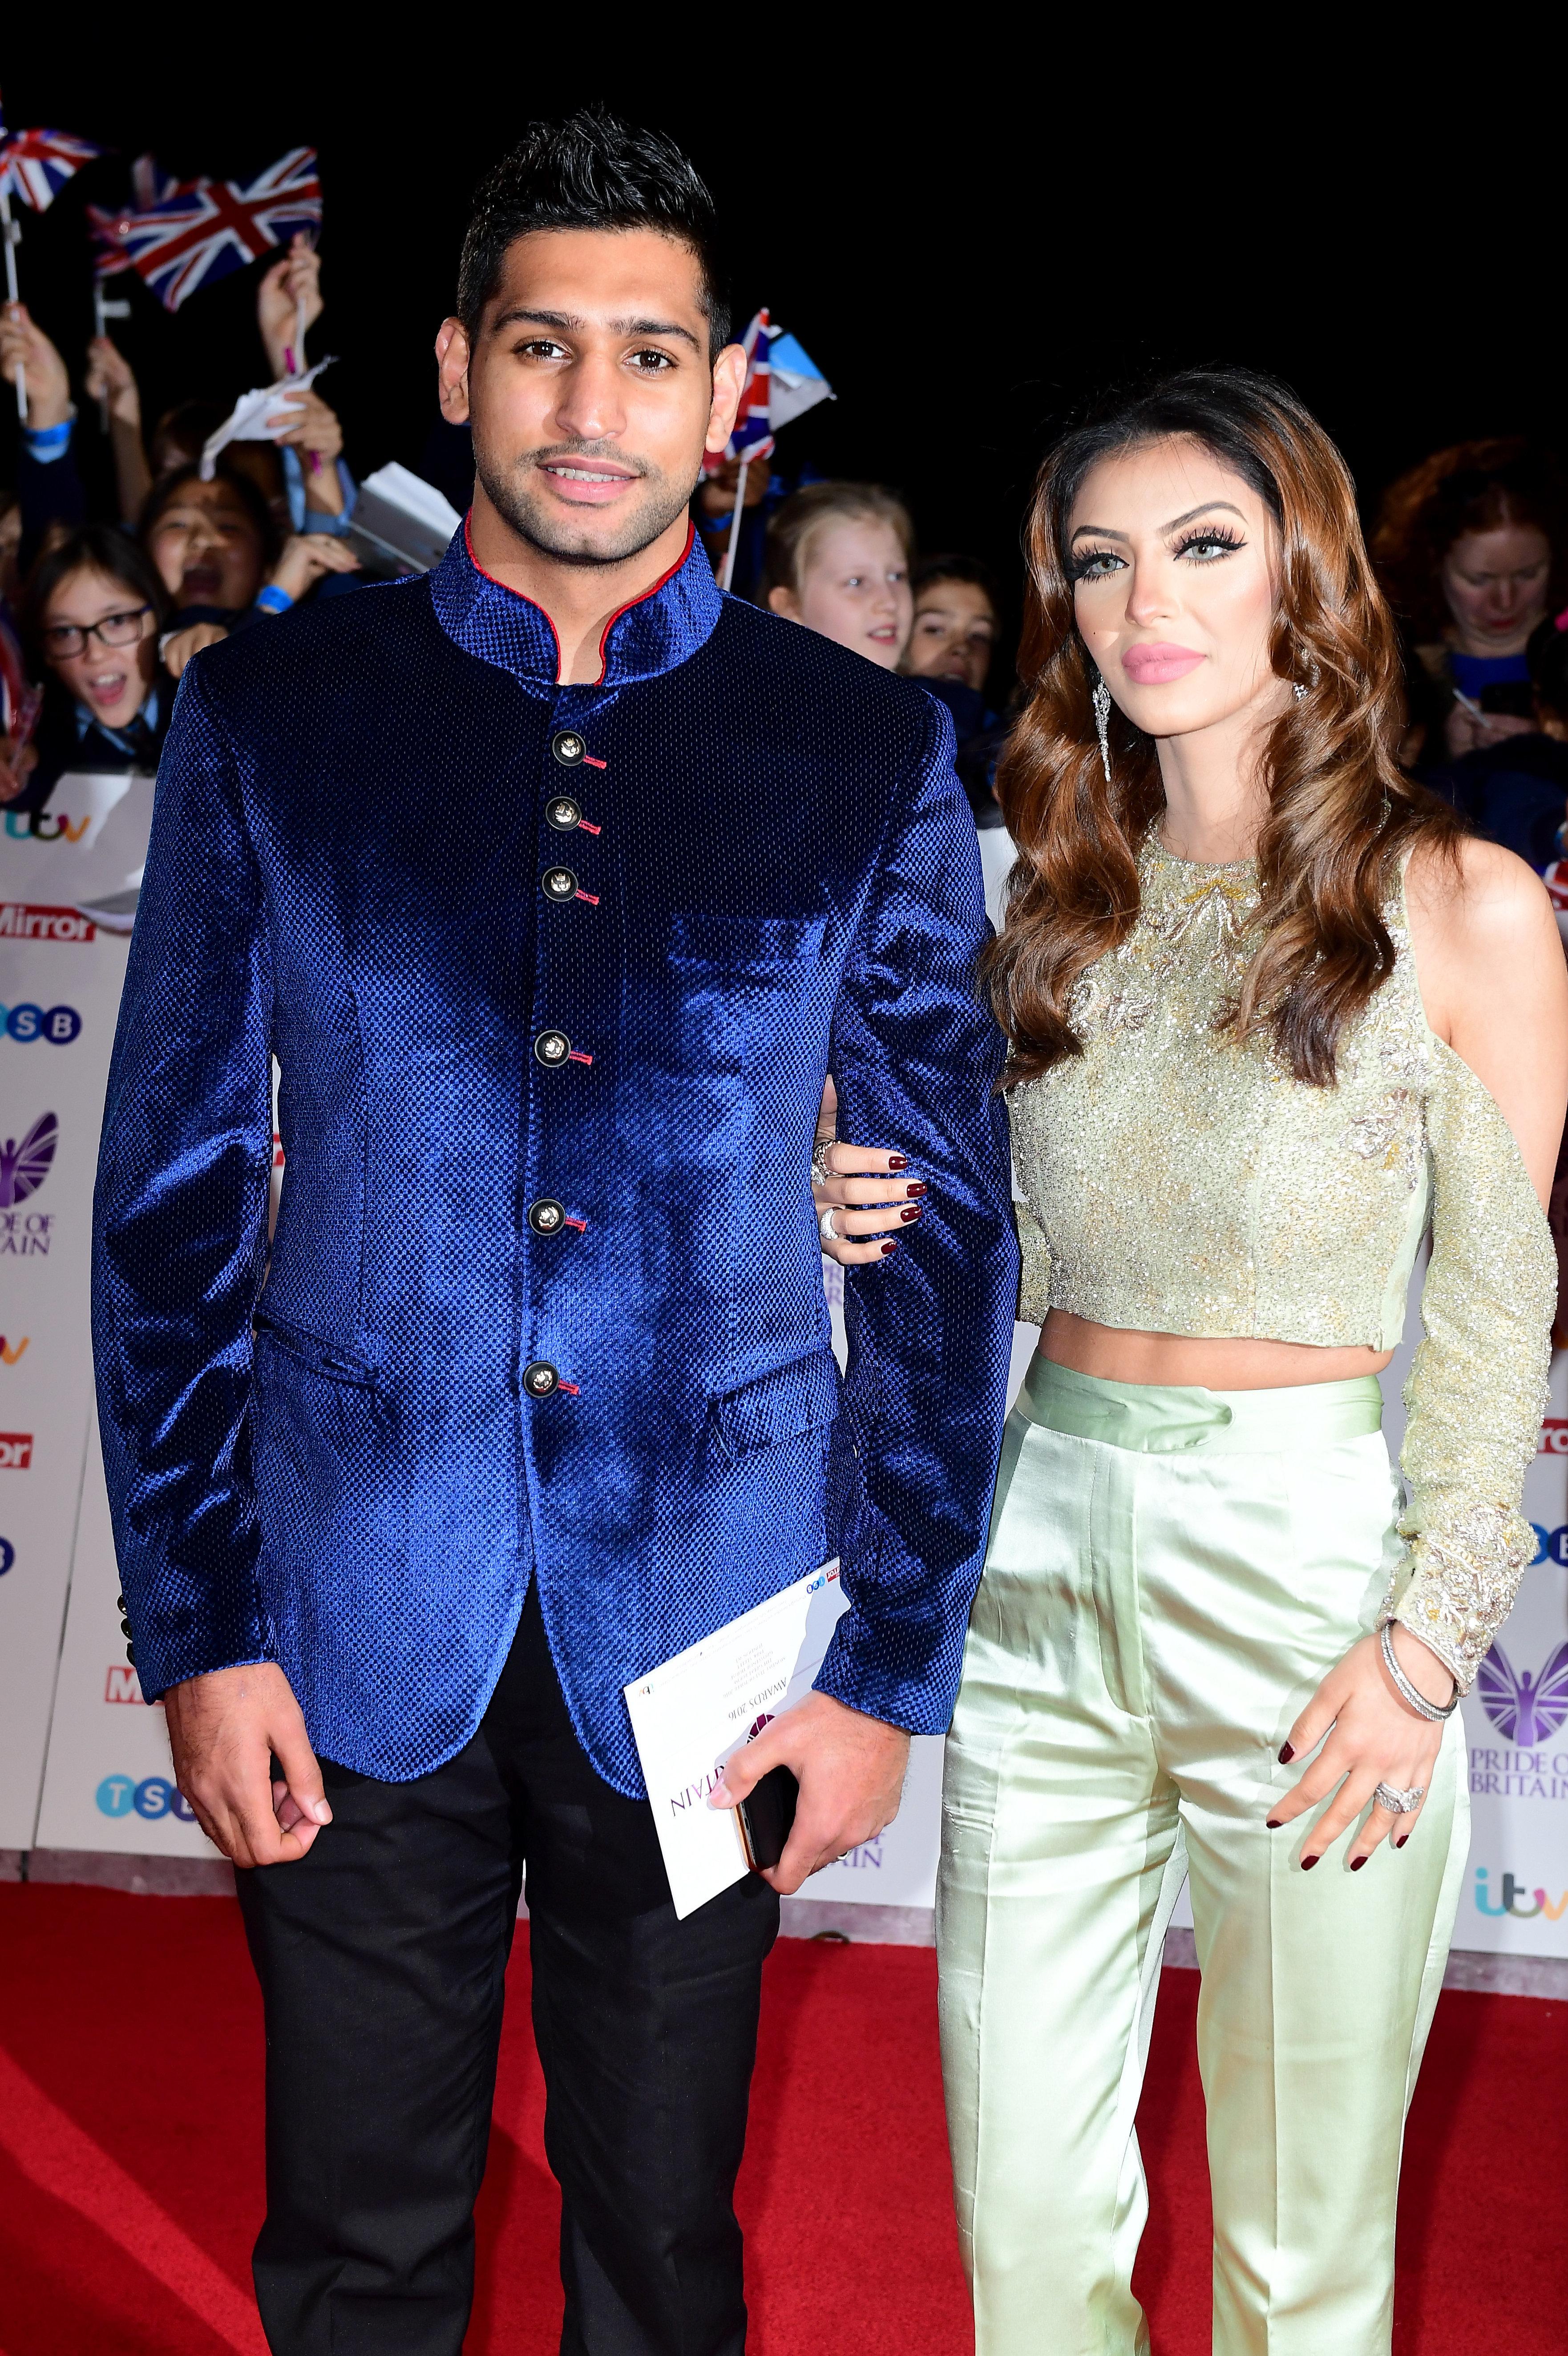 Amir Khan and his wifeFaryal Makhdoom have